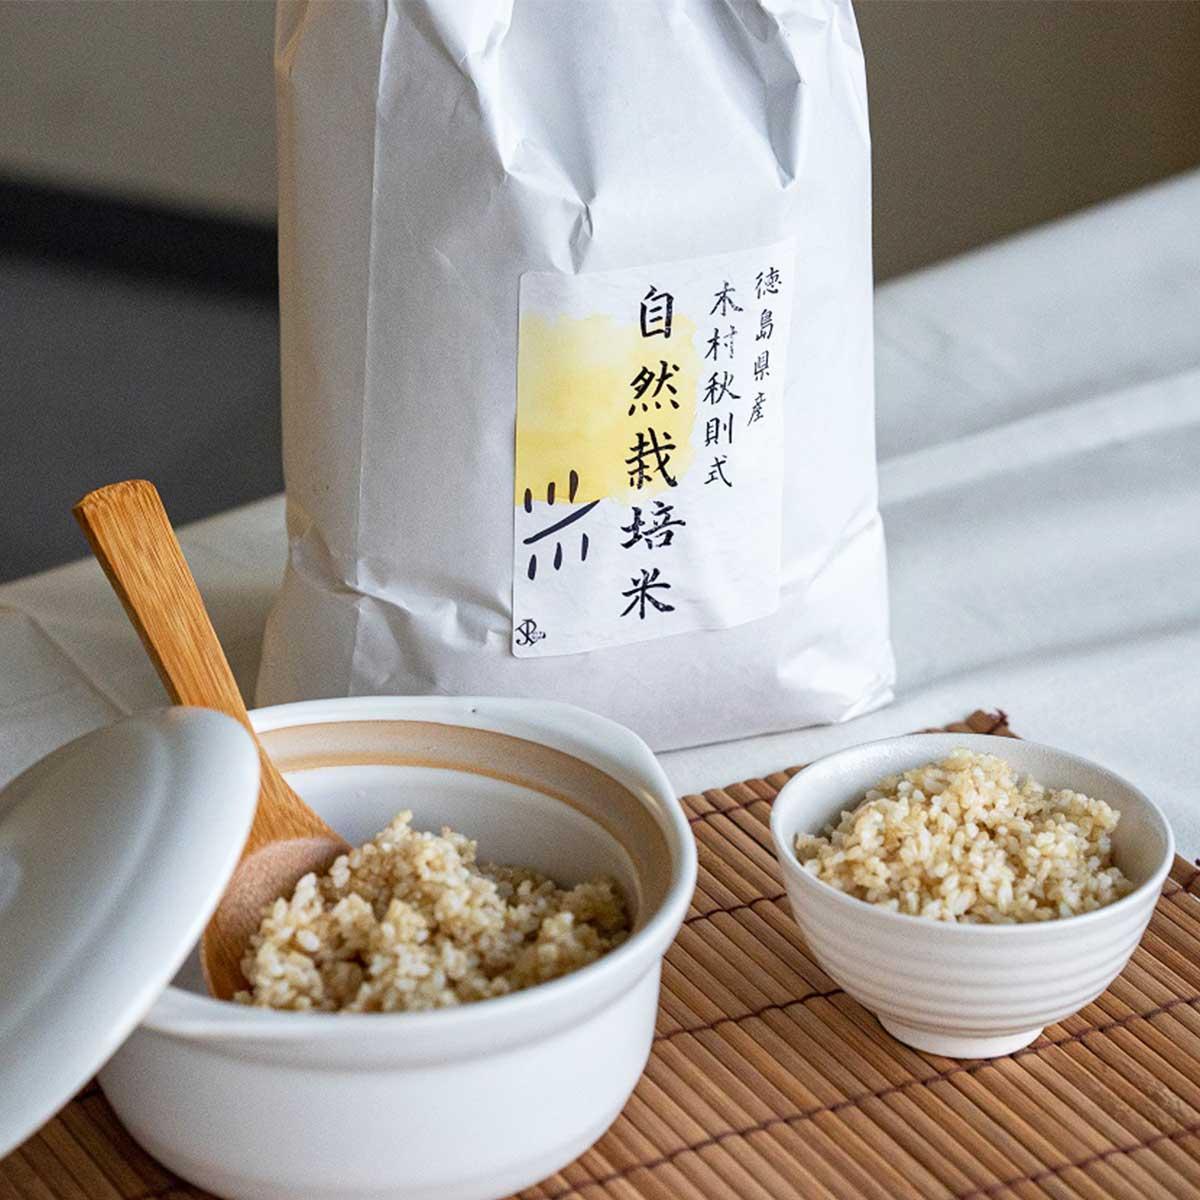 OrganicGarden 美味しい関係 玄米 徳島県産 農薬・肥料不使用 自然栽培米「あけぼの」玄米〔5kg〕